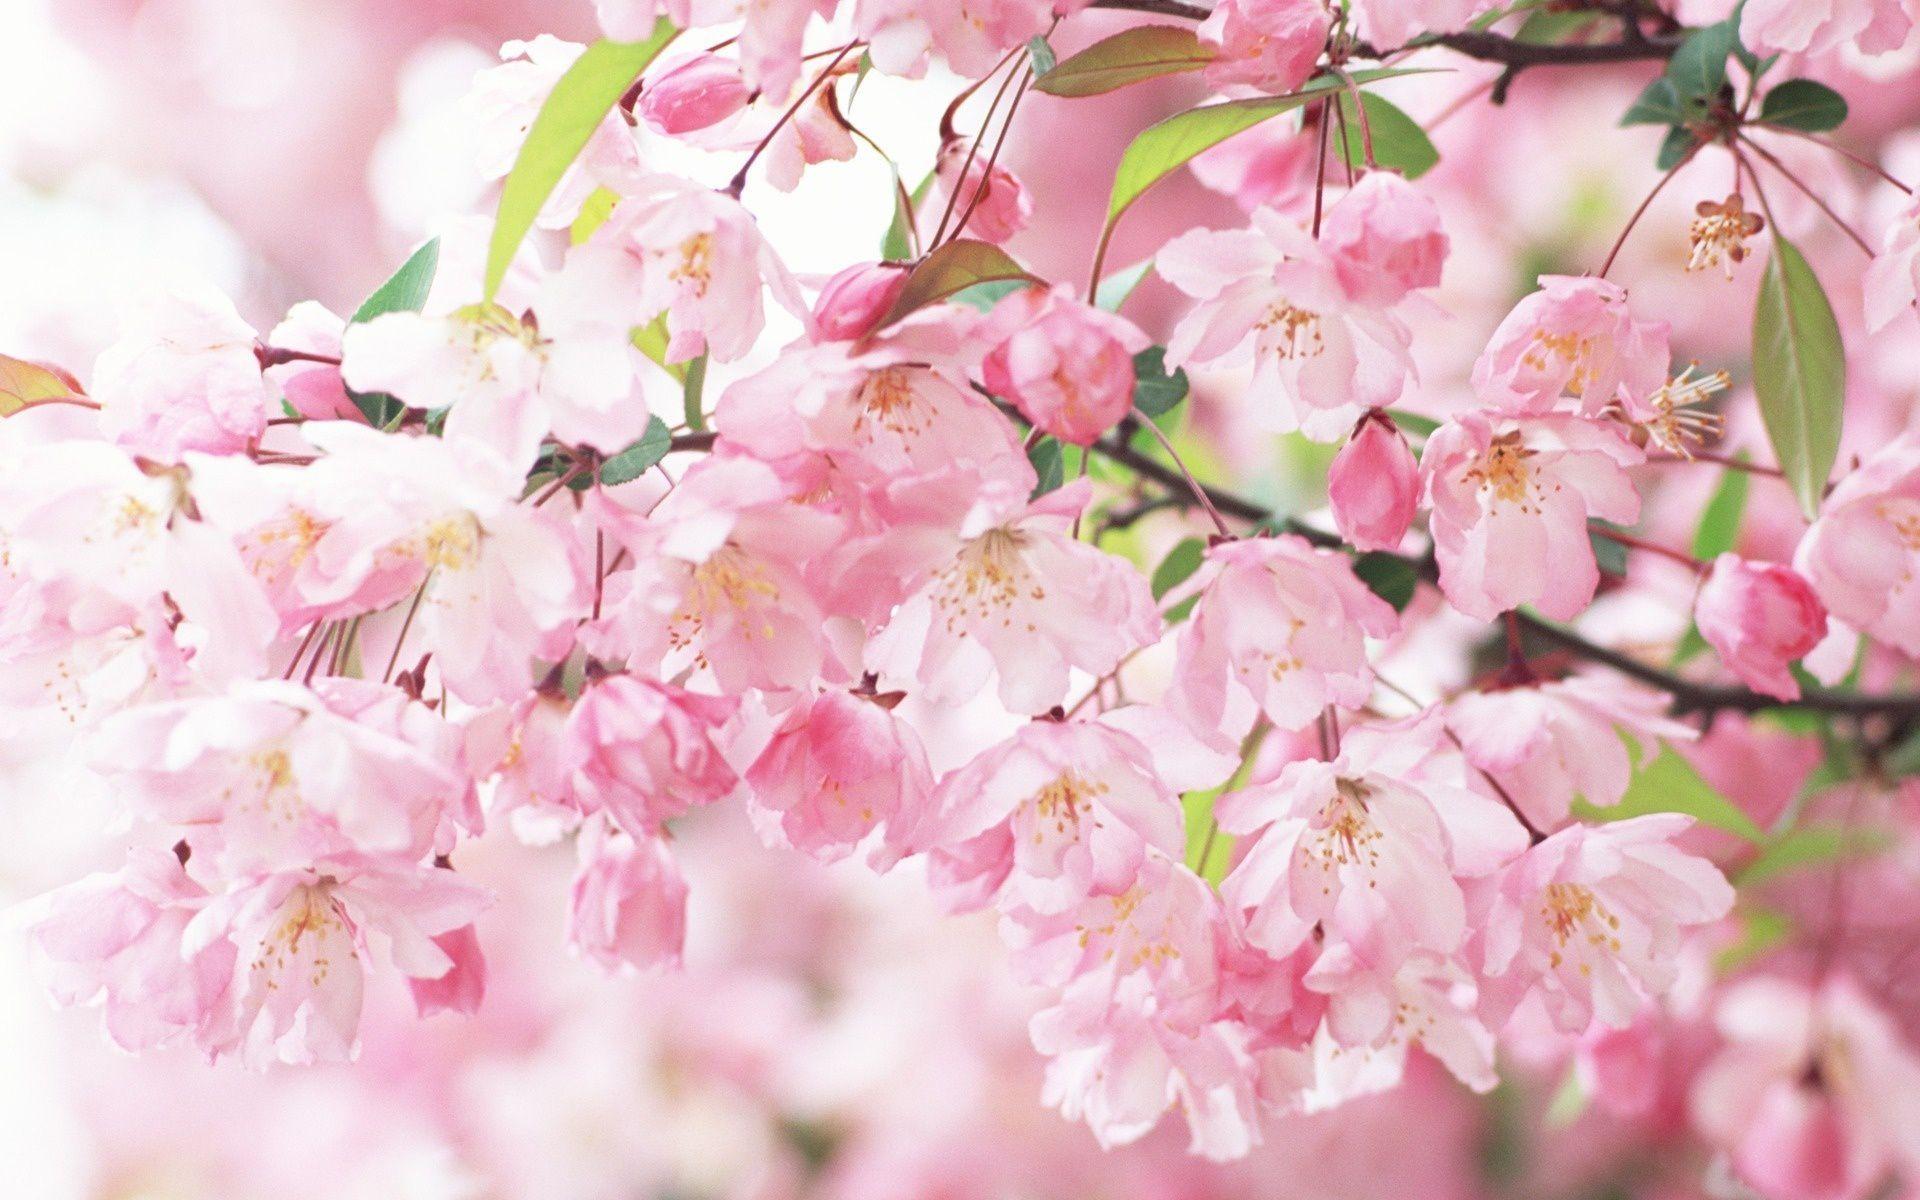 Flowers As Wallpaper Wallfree 100 Free High Definition Wallpaper High Definition Background 4k Wallpaper 4k Desktop Backgrou Bunga Sakura Bunga Gambar